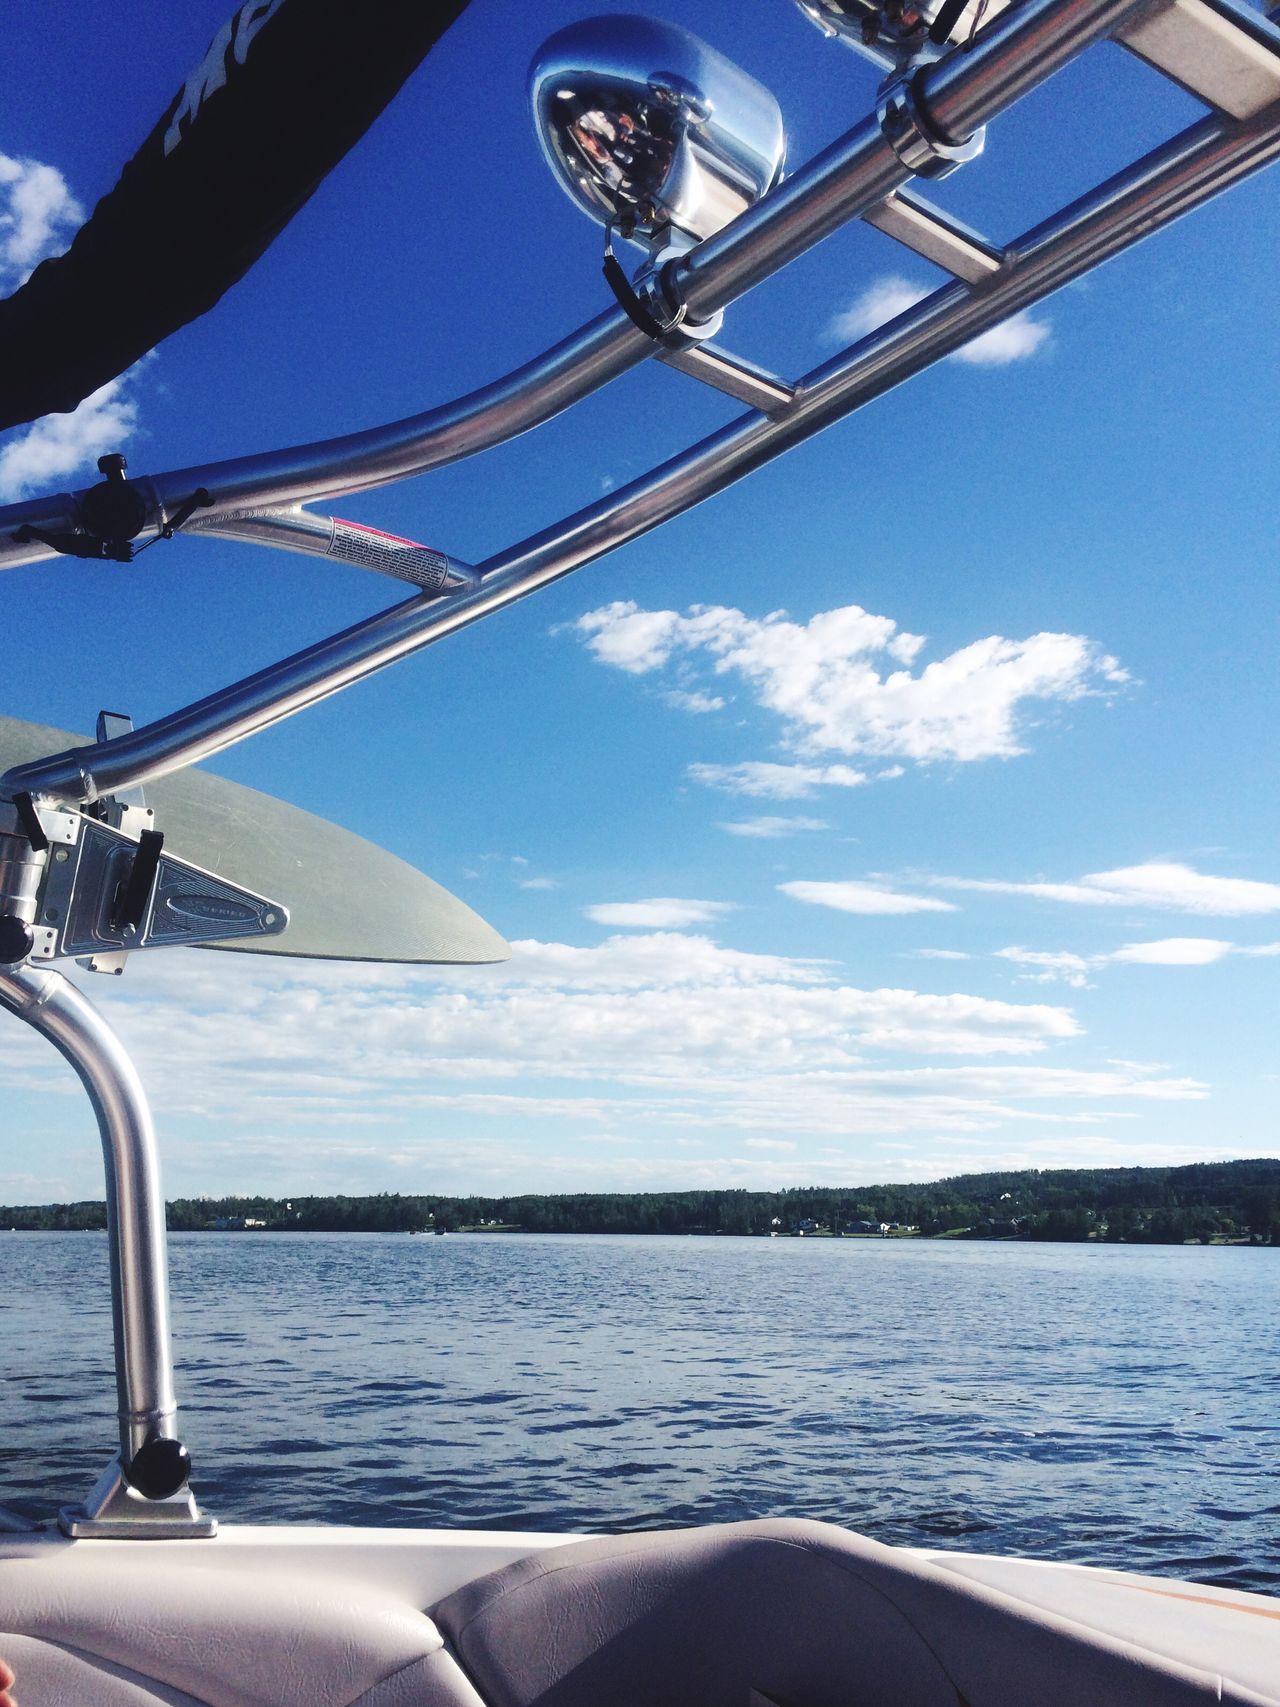 Just love surfing Canada Lake Lake View Blue Sky British Columbia Wakesurfing Wakeboarding Boat